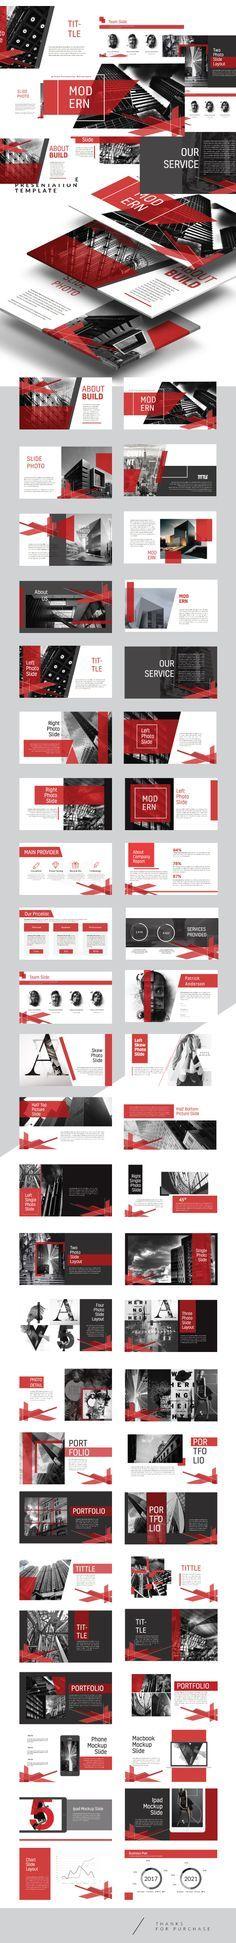 Arch - Creative Multipurpose Keynote Template - #Creative #Keynote #Templates Download here:  https://graphicriver.net/item/arch-creative-multipurpose-keynote-template/19530749?ref=alena994